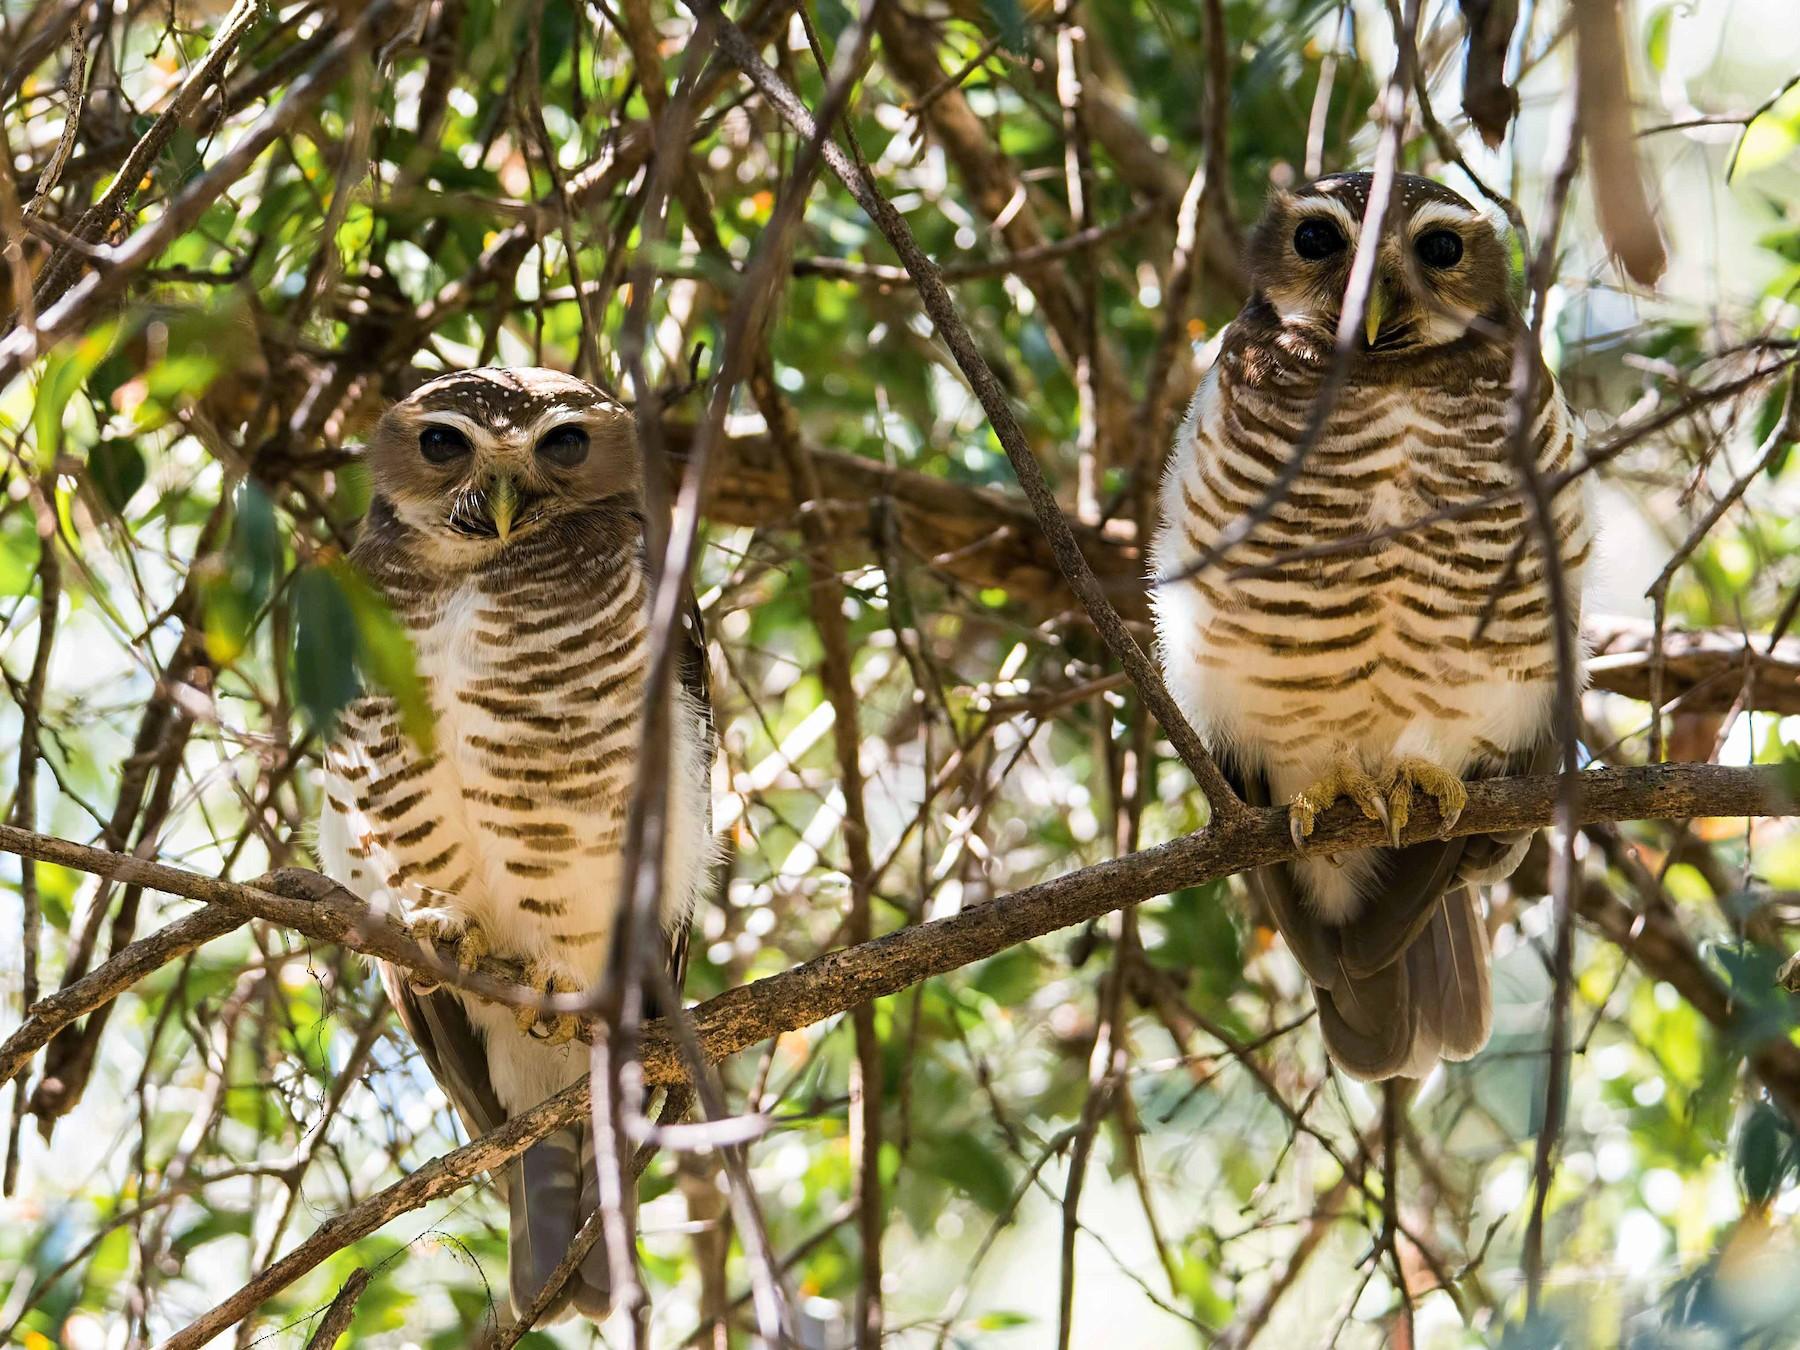 White-browed Owl - Shailesh Pinto